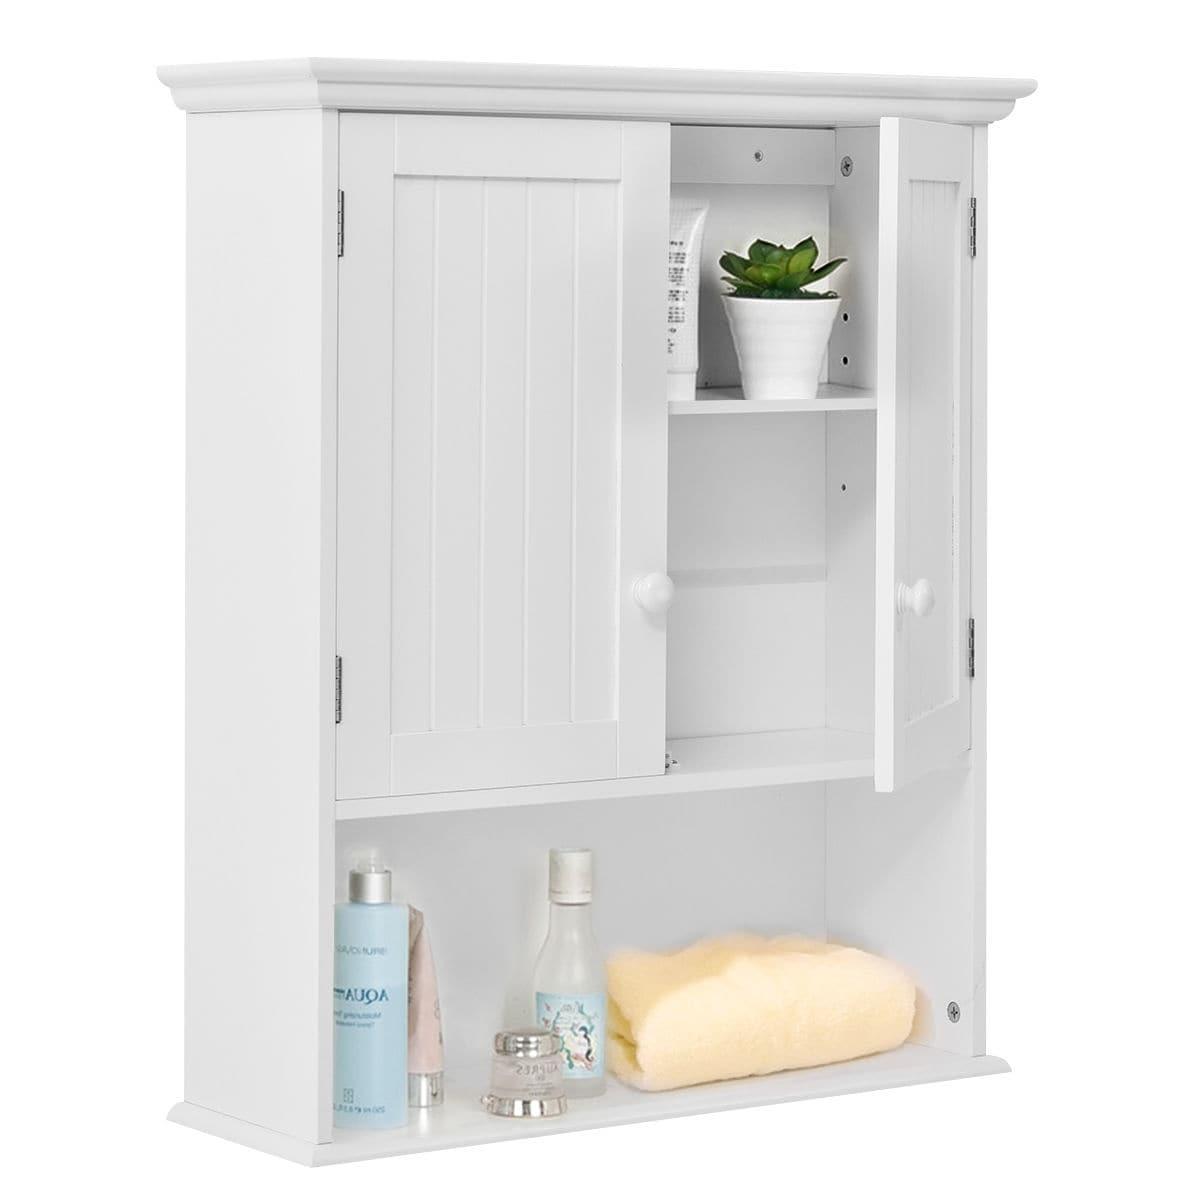 Costway Wall Mount Bathroom Cabinet Storage Organizer Medicine Kitchen Laundry Free Shipping Today 19856634